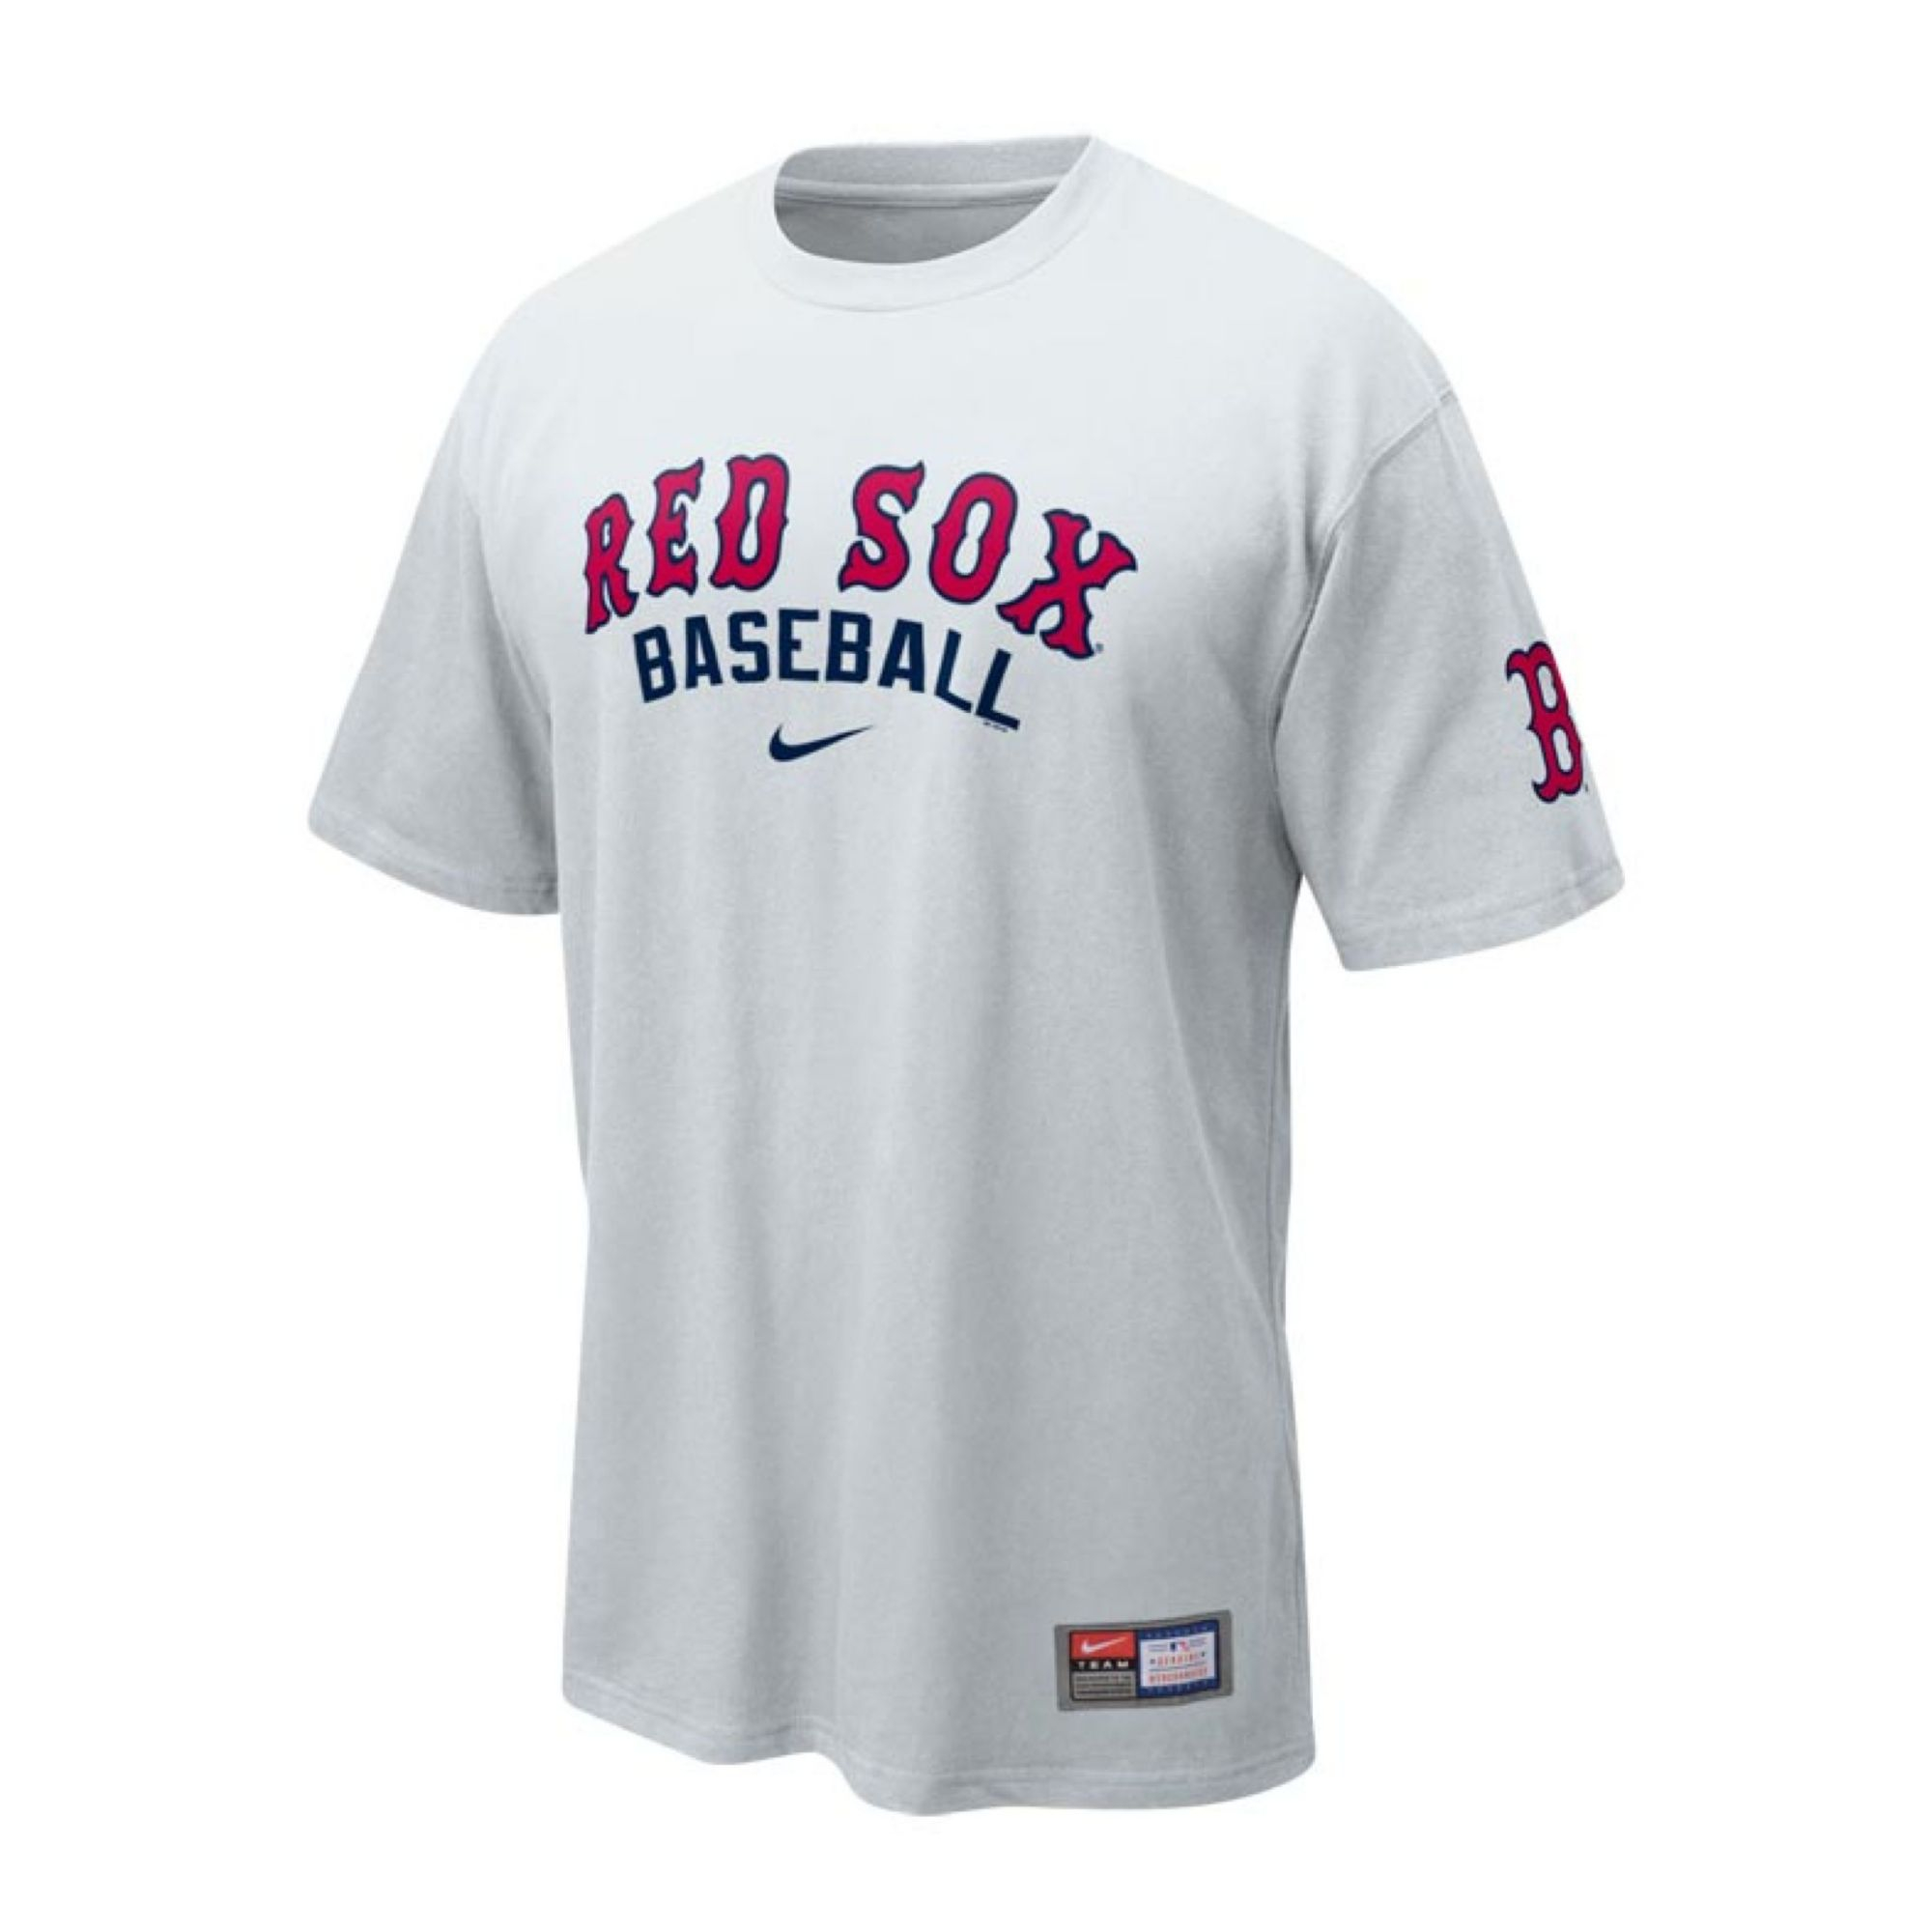 huge selection of c959e 0eaaa Boston Red Sox Shirts Sale | Azərbaycan Dillər Universiteti